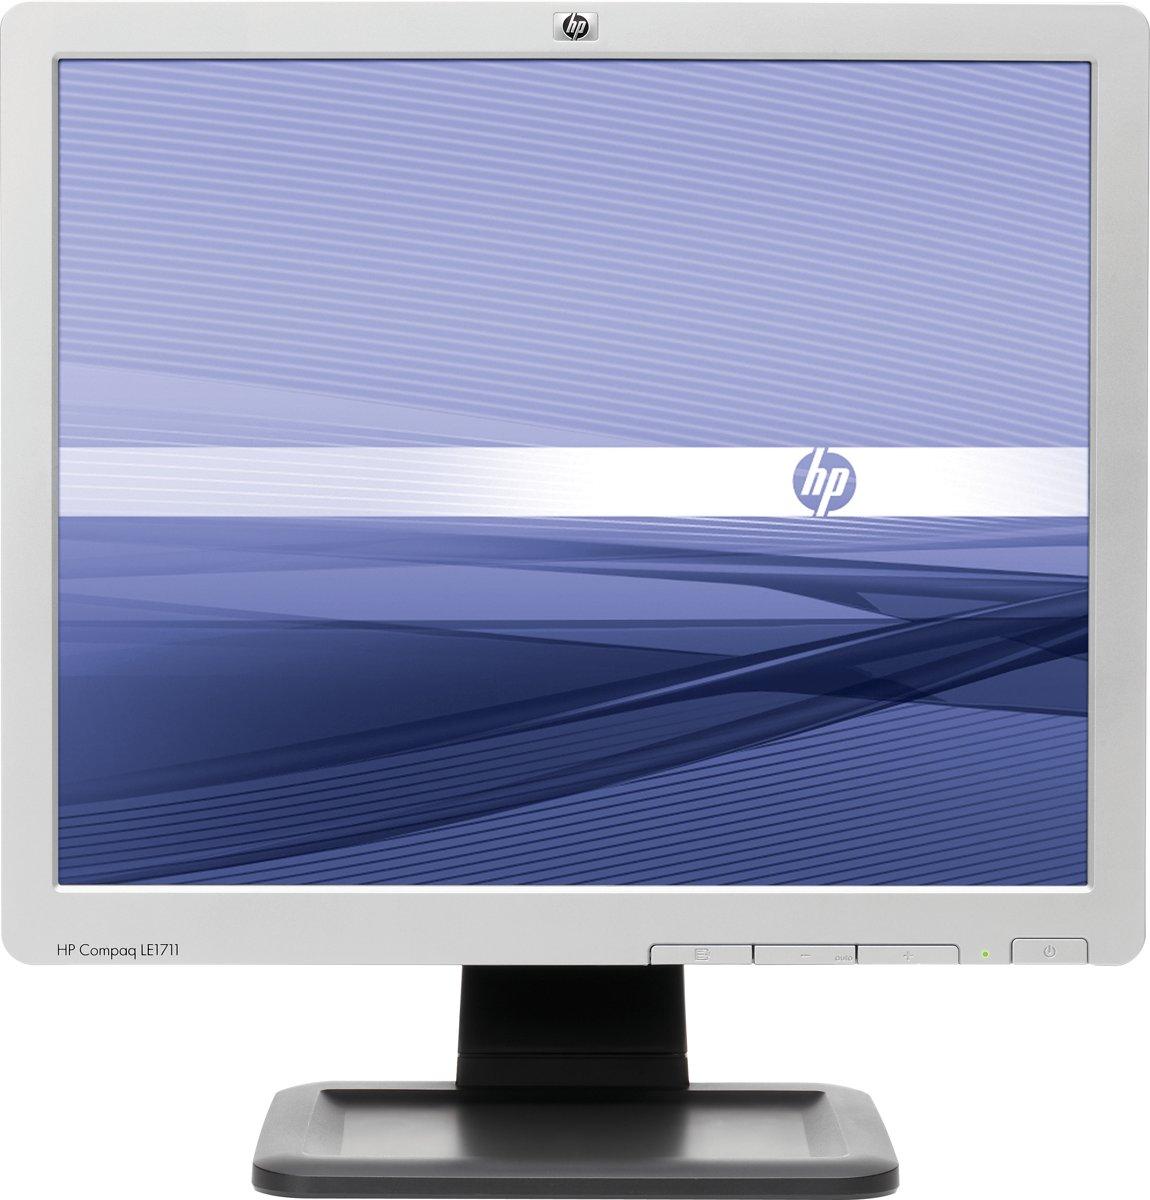 HP Compaq LE1711 - Monitor